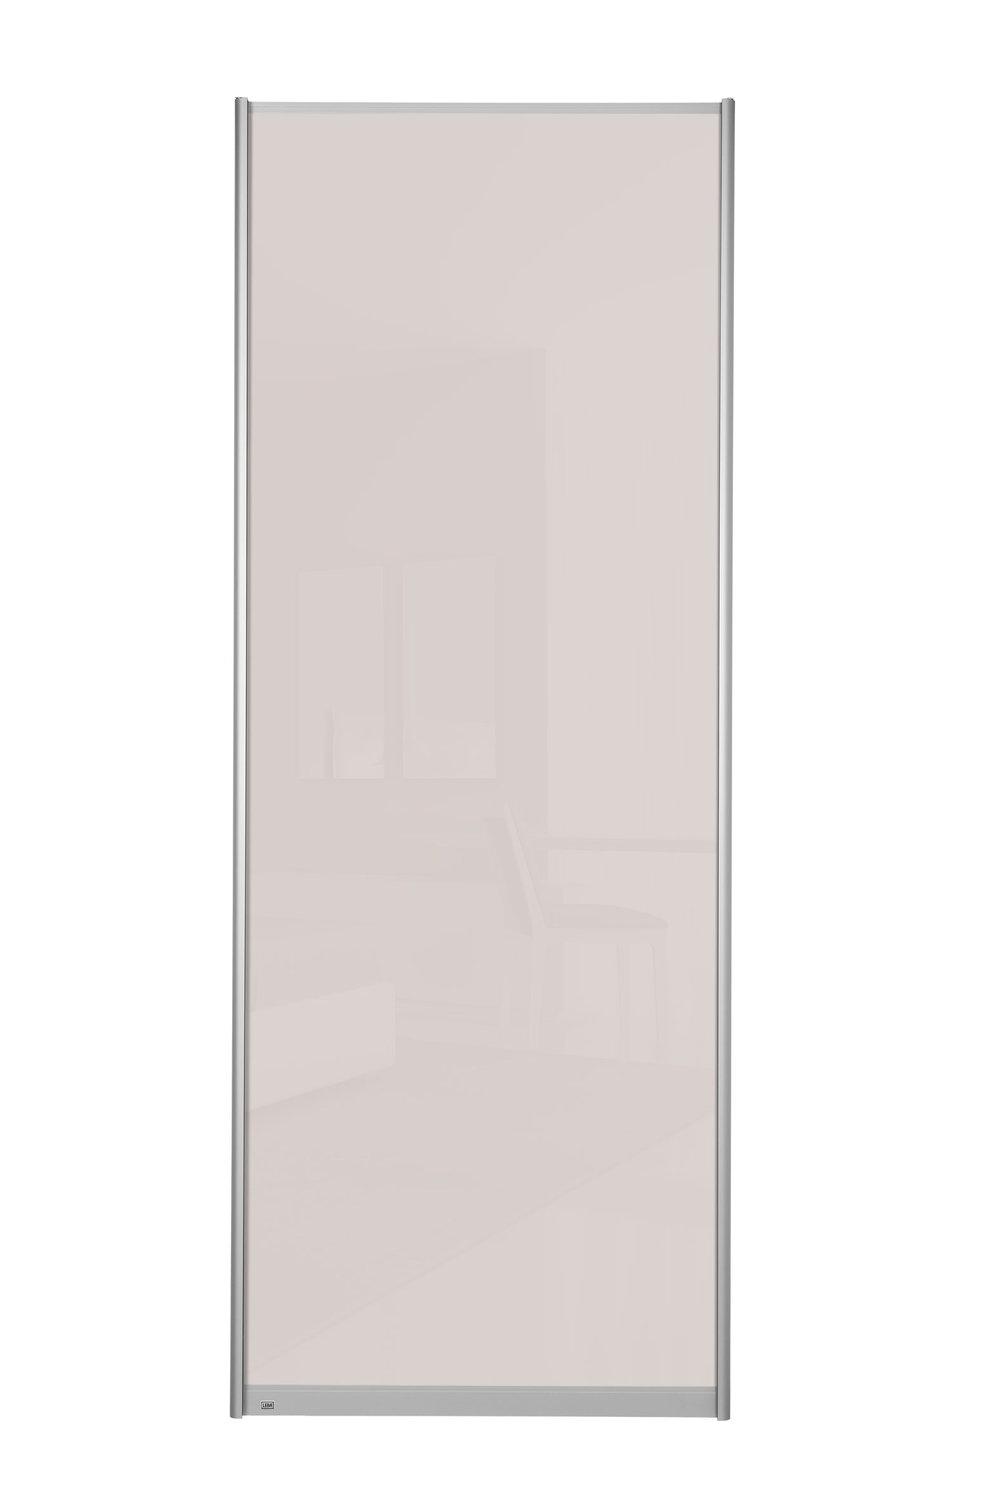 F7113 - Sand beige